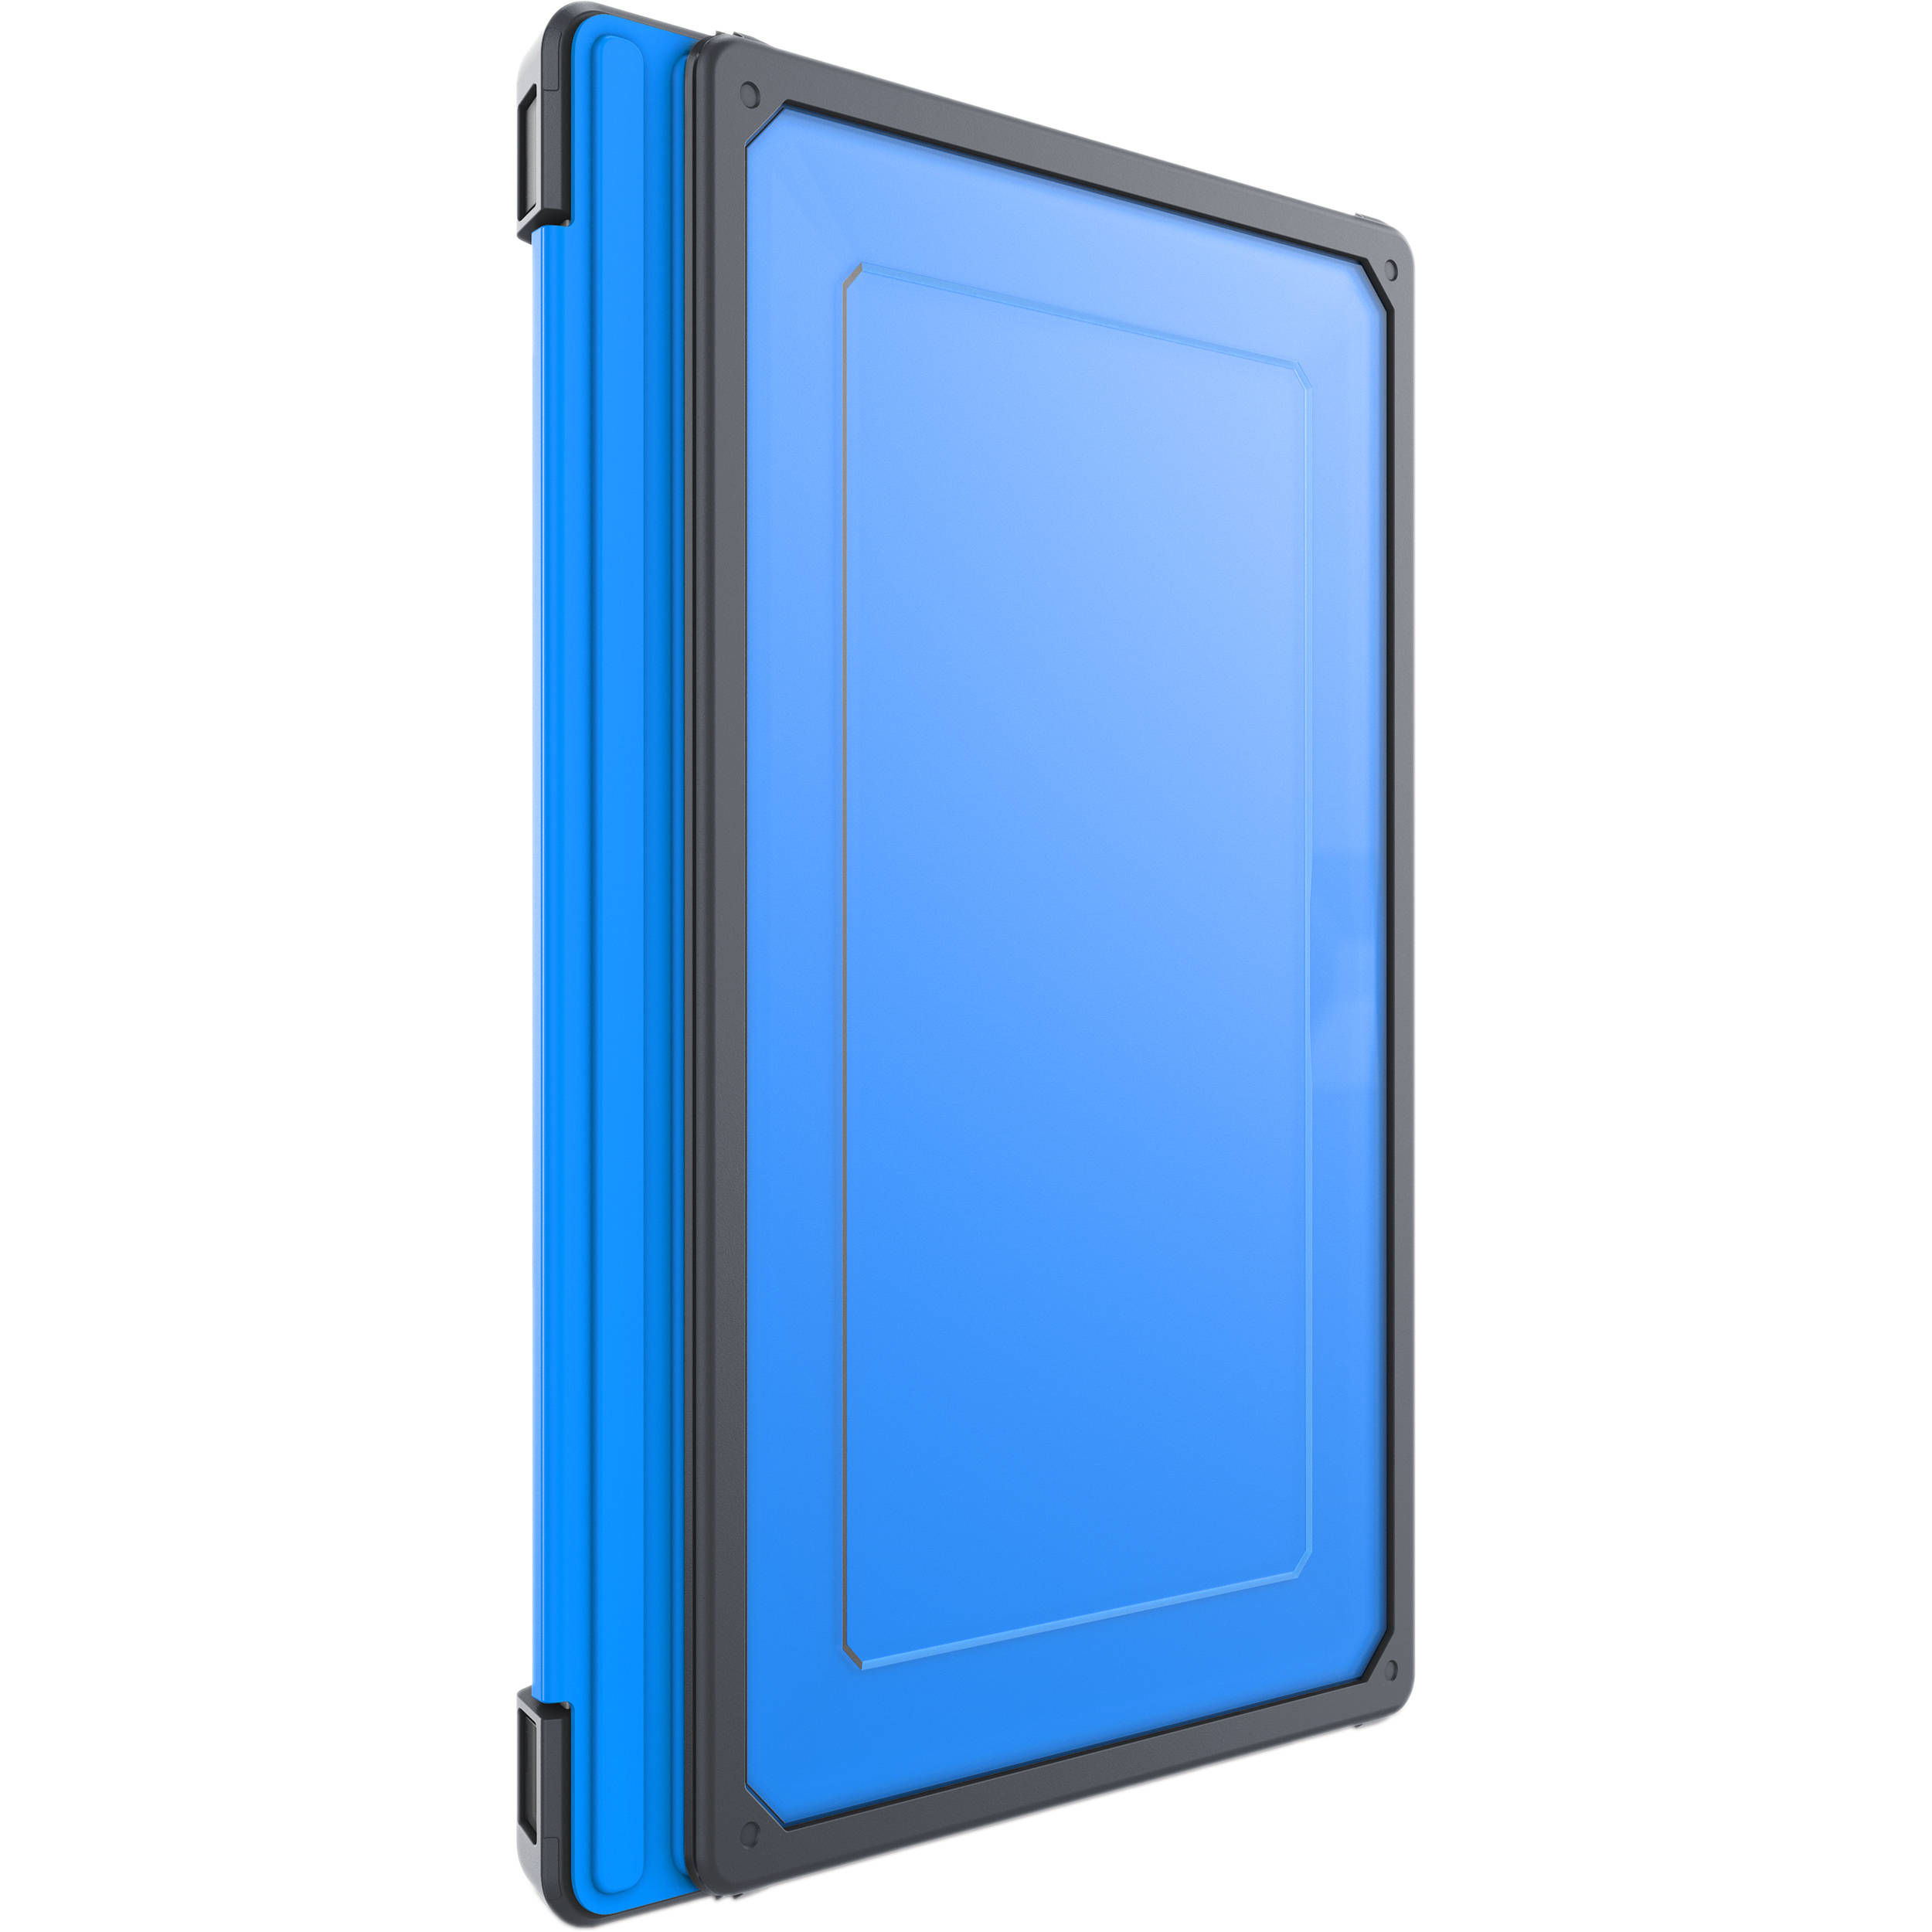 best service 74b0e e638d OtterBox Symmetry Series Case for Surface Pro/Pro 4 (Slate Gray)